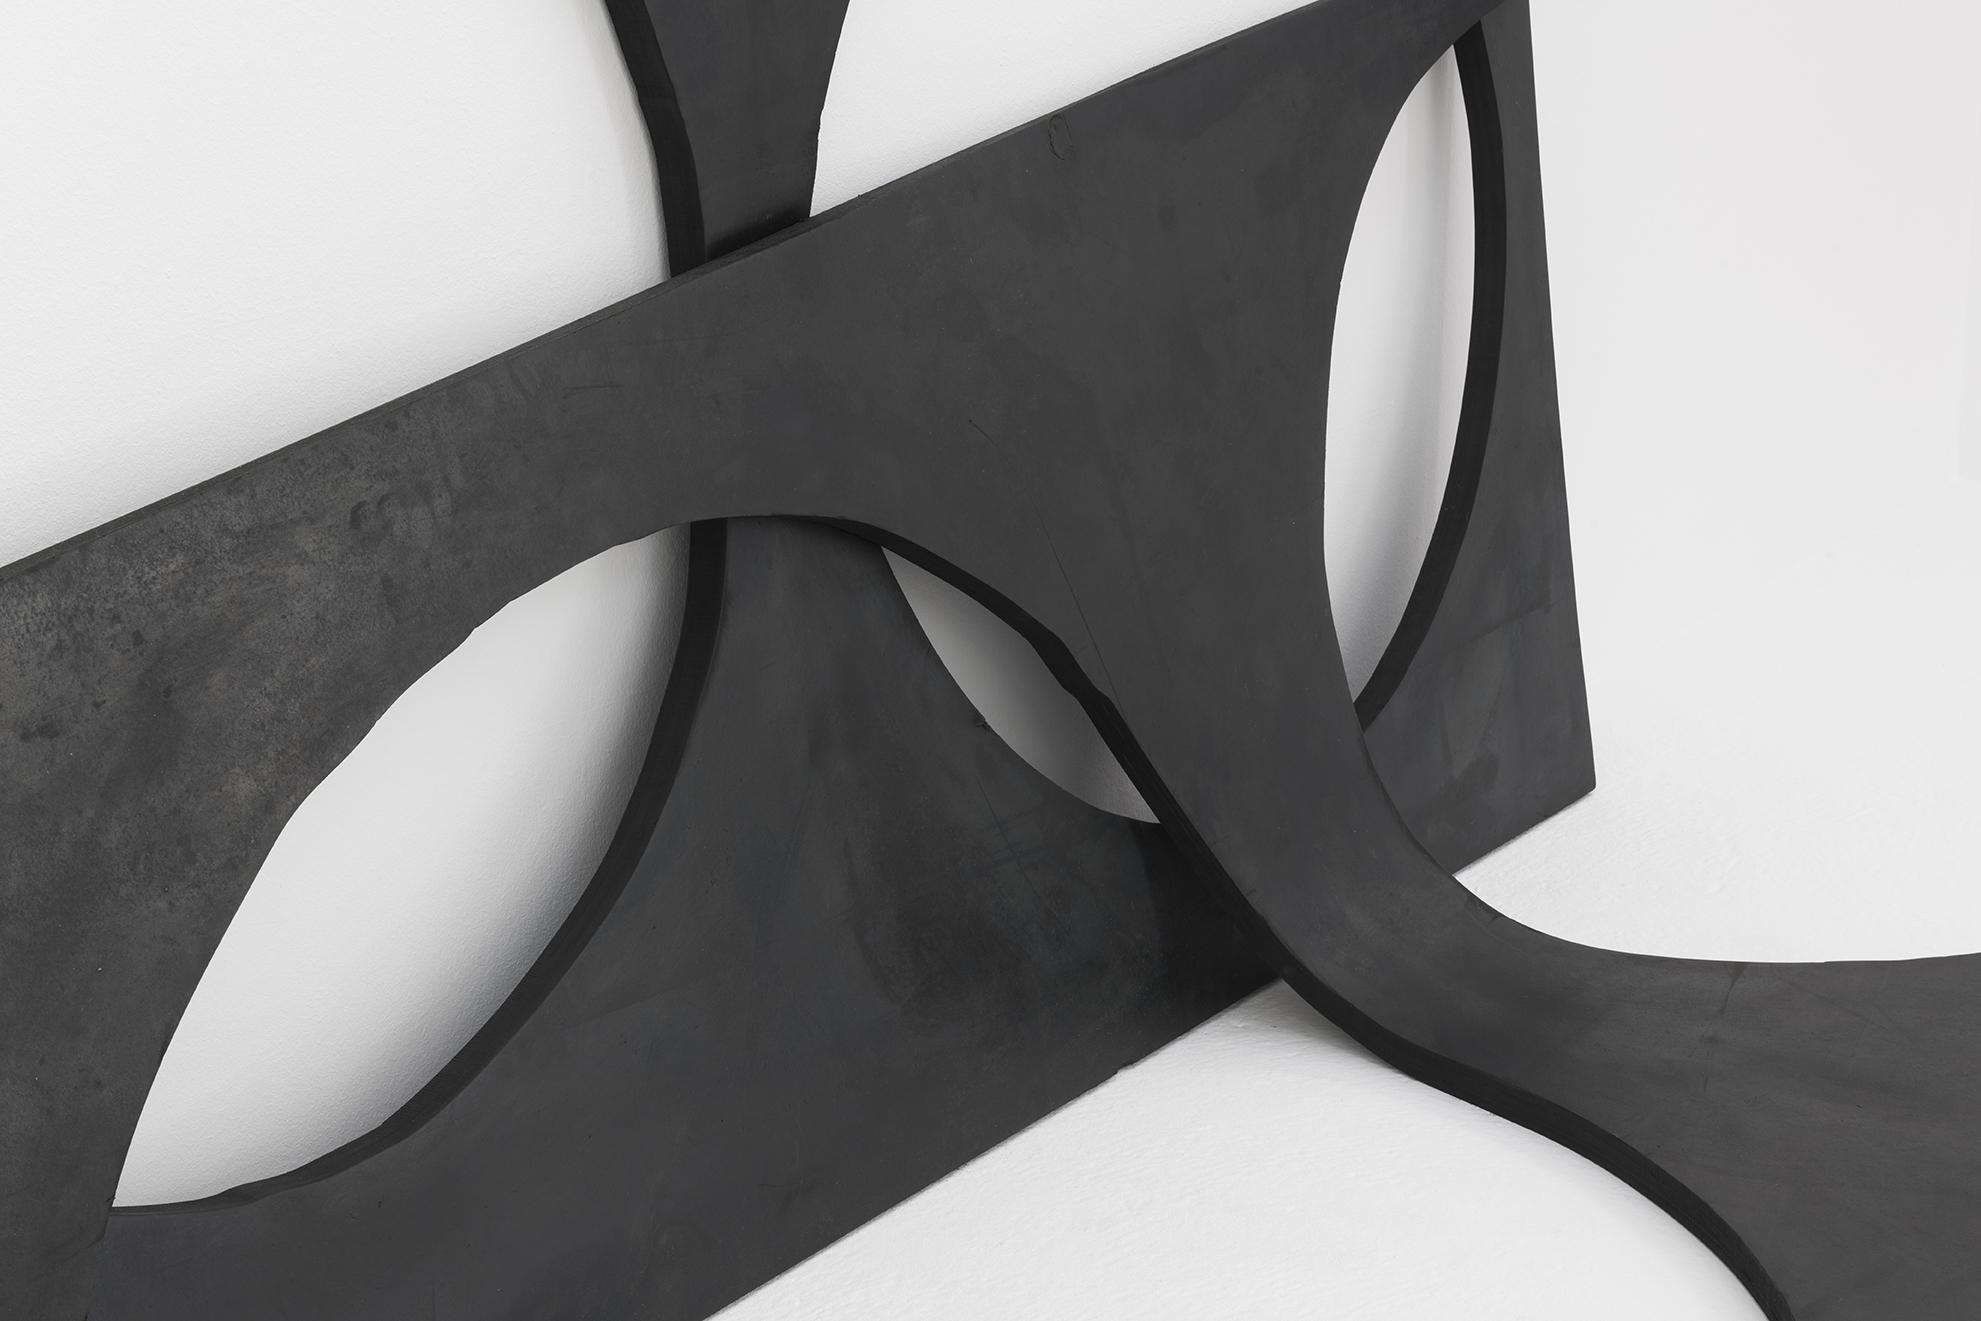 ASIER MENDIZABAL.Agoramaquia (Versión nº1), 2014. (Detail) | Accrochage #4: Dauder, Jotta, Mendizabal & Oriol Aribau | ProjecteSD